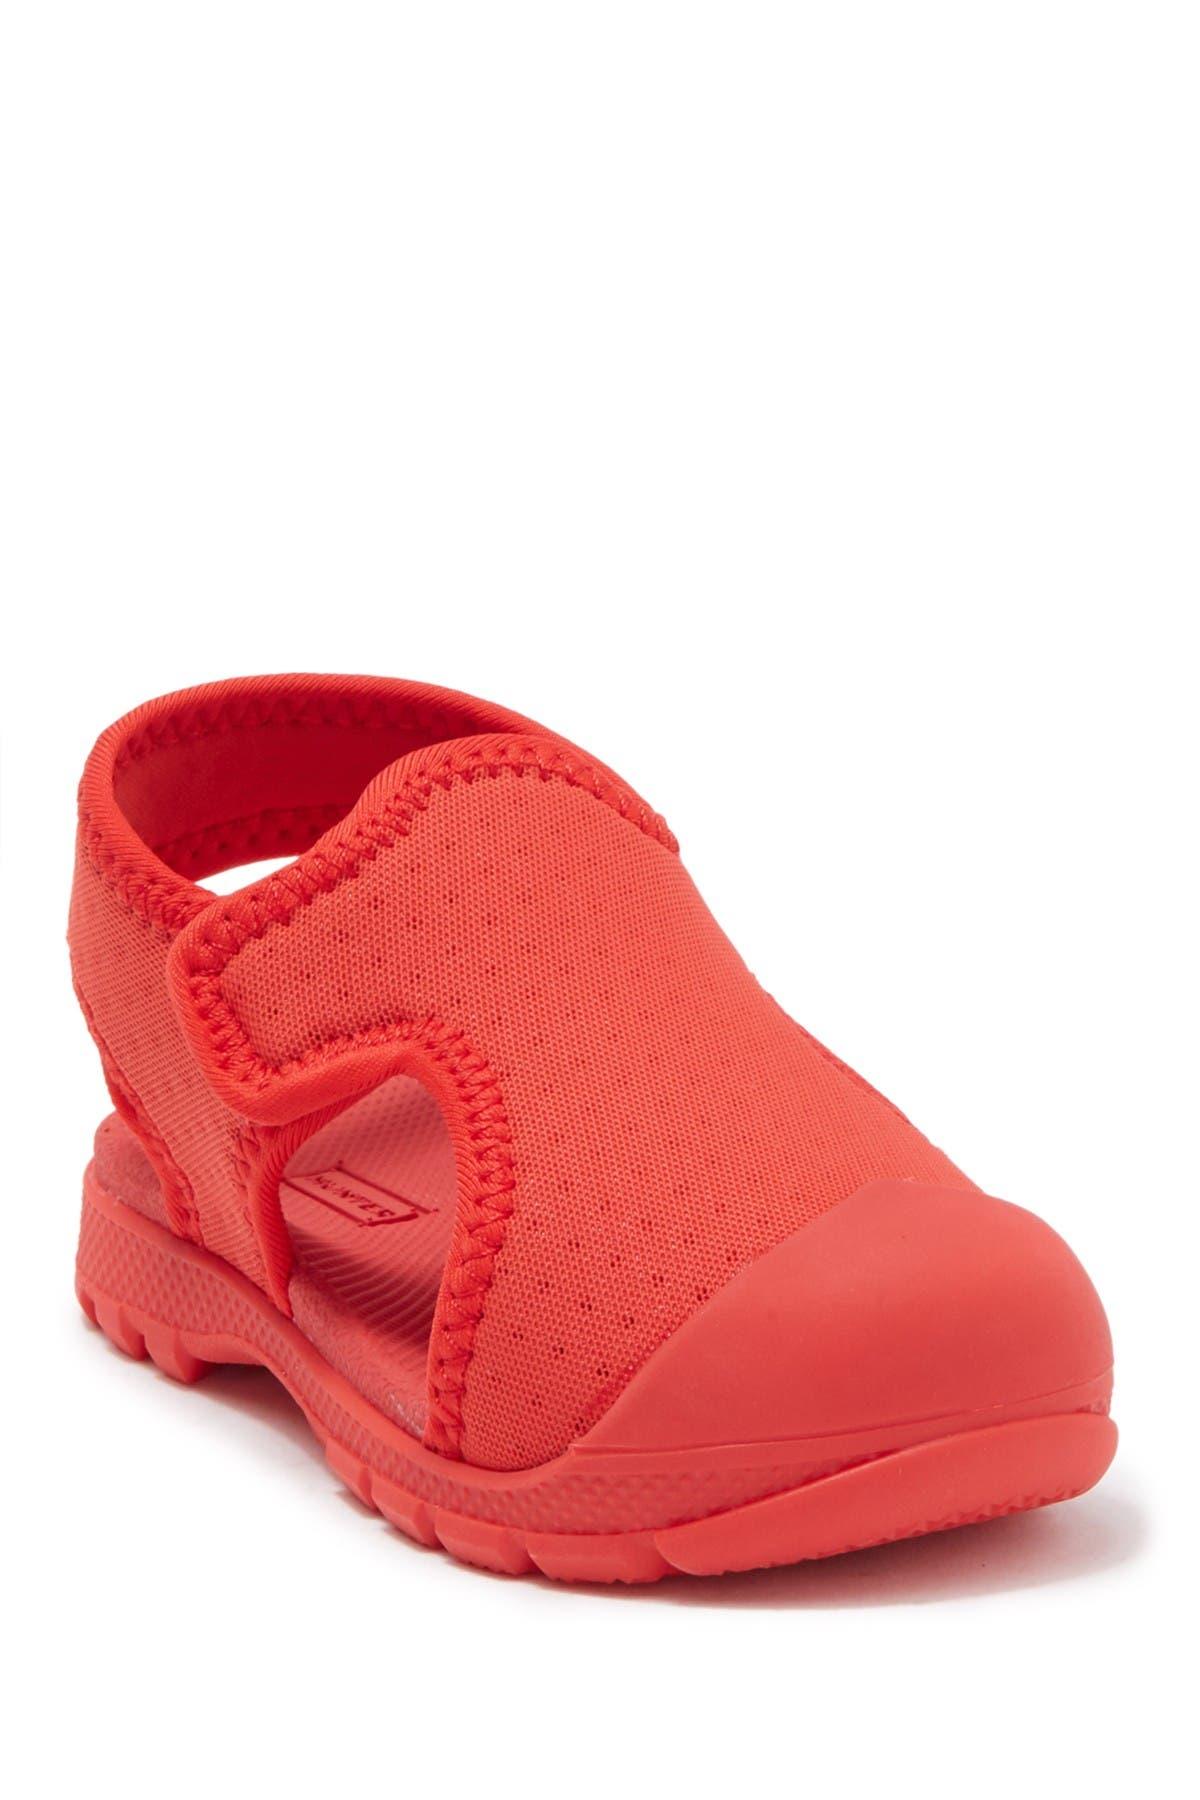 Image of Hunter Original Outdoor Walking Sandal